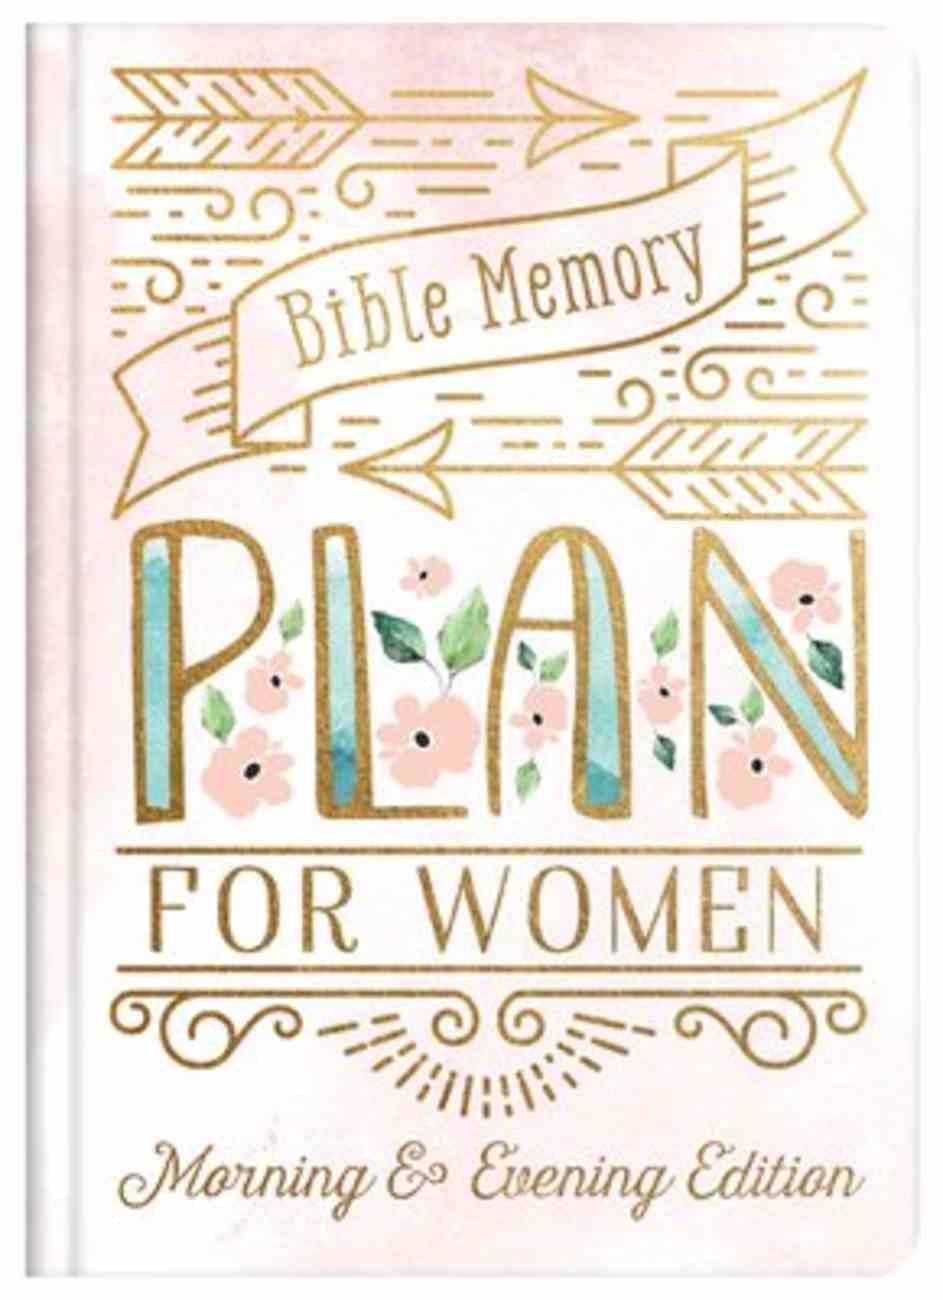 Bible Memory Plan For Women: Morning & Evening Edition Hardback